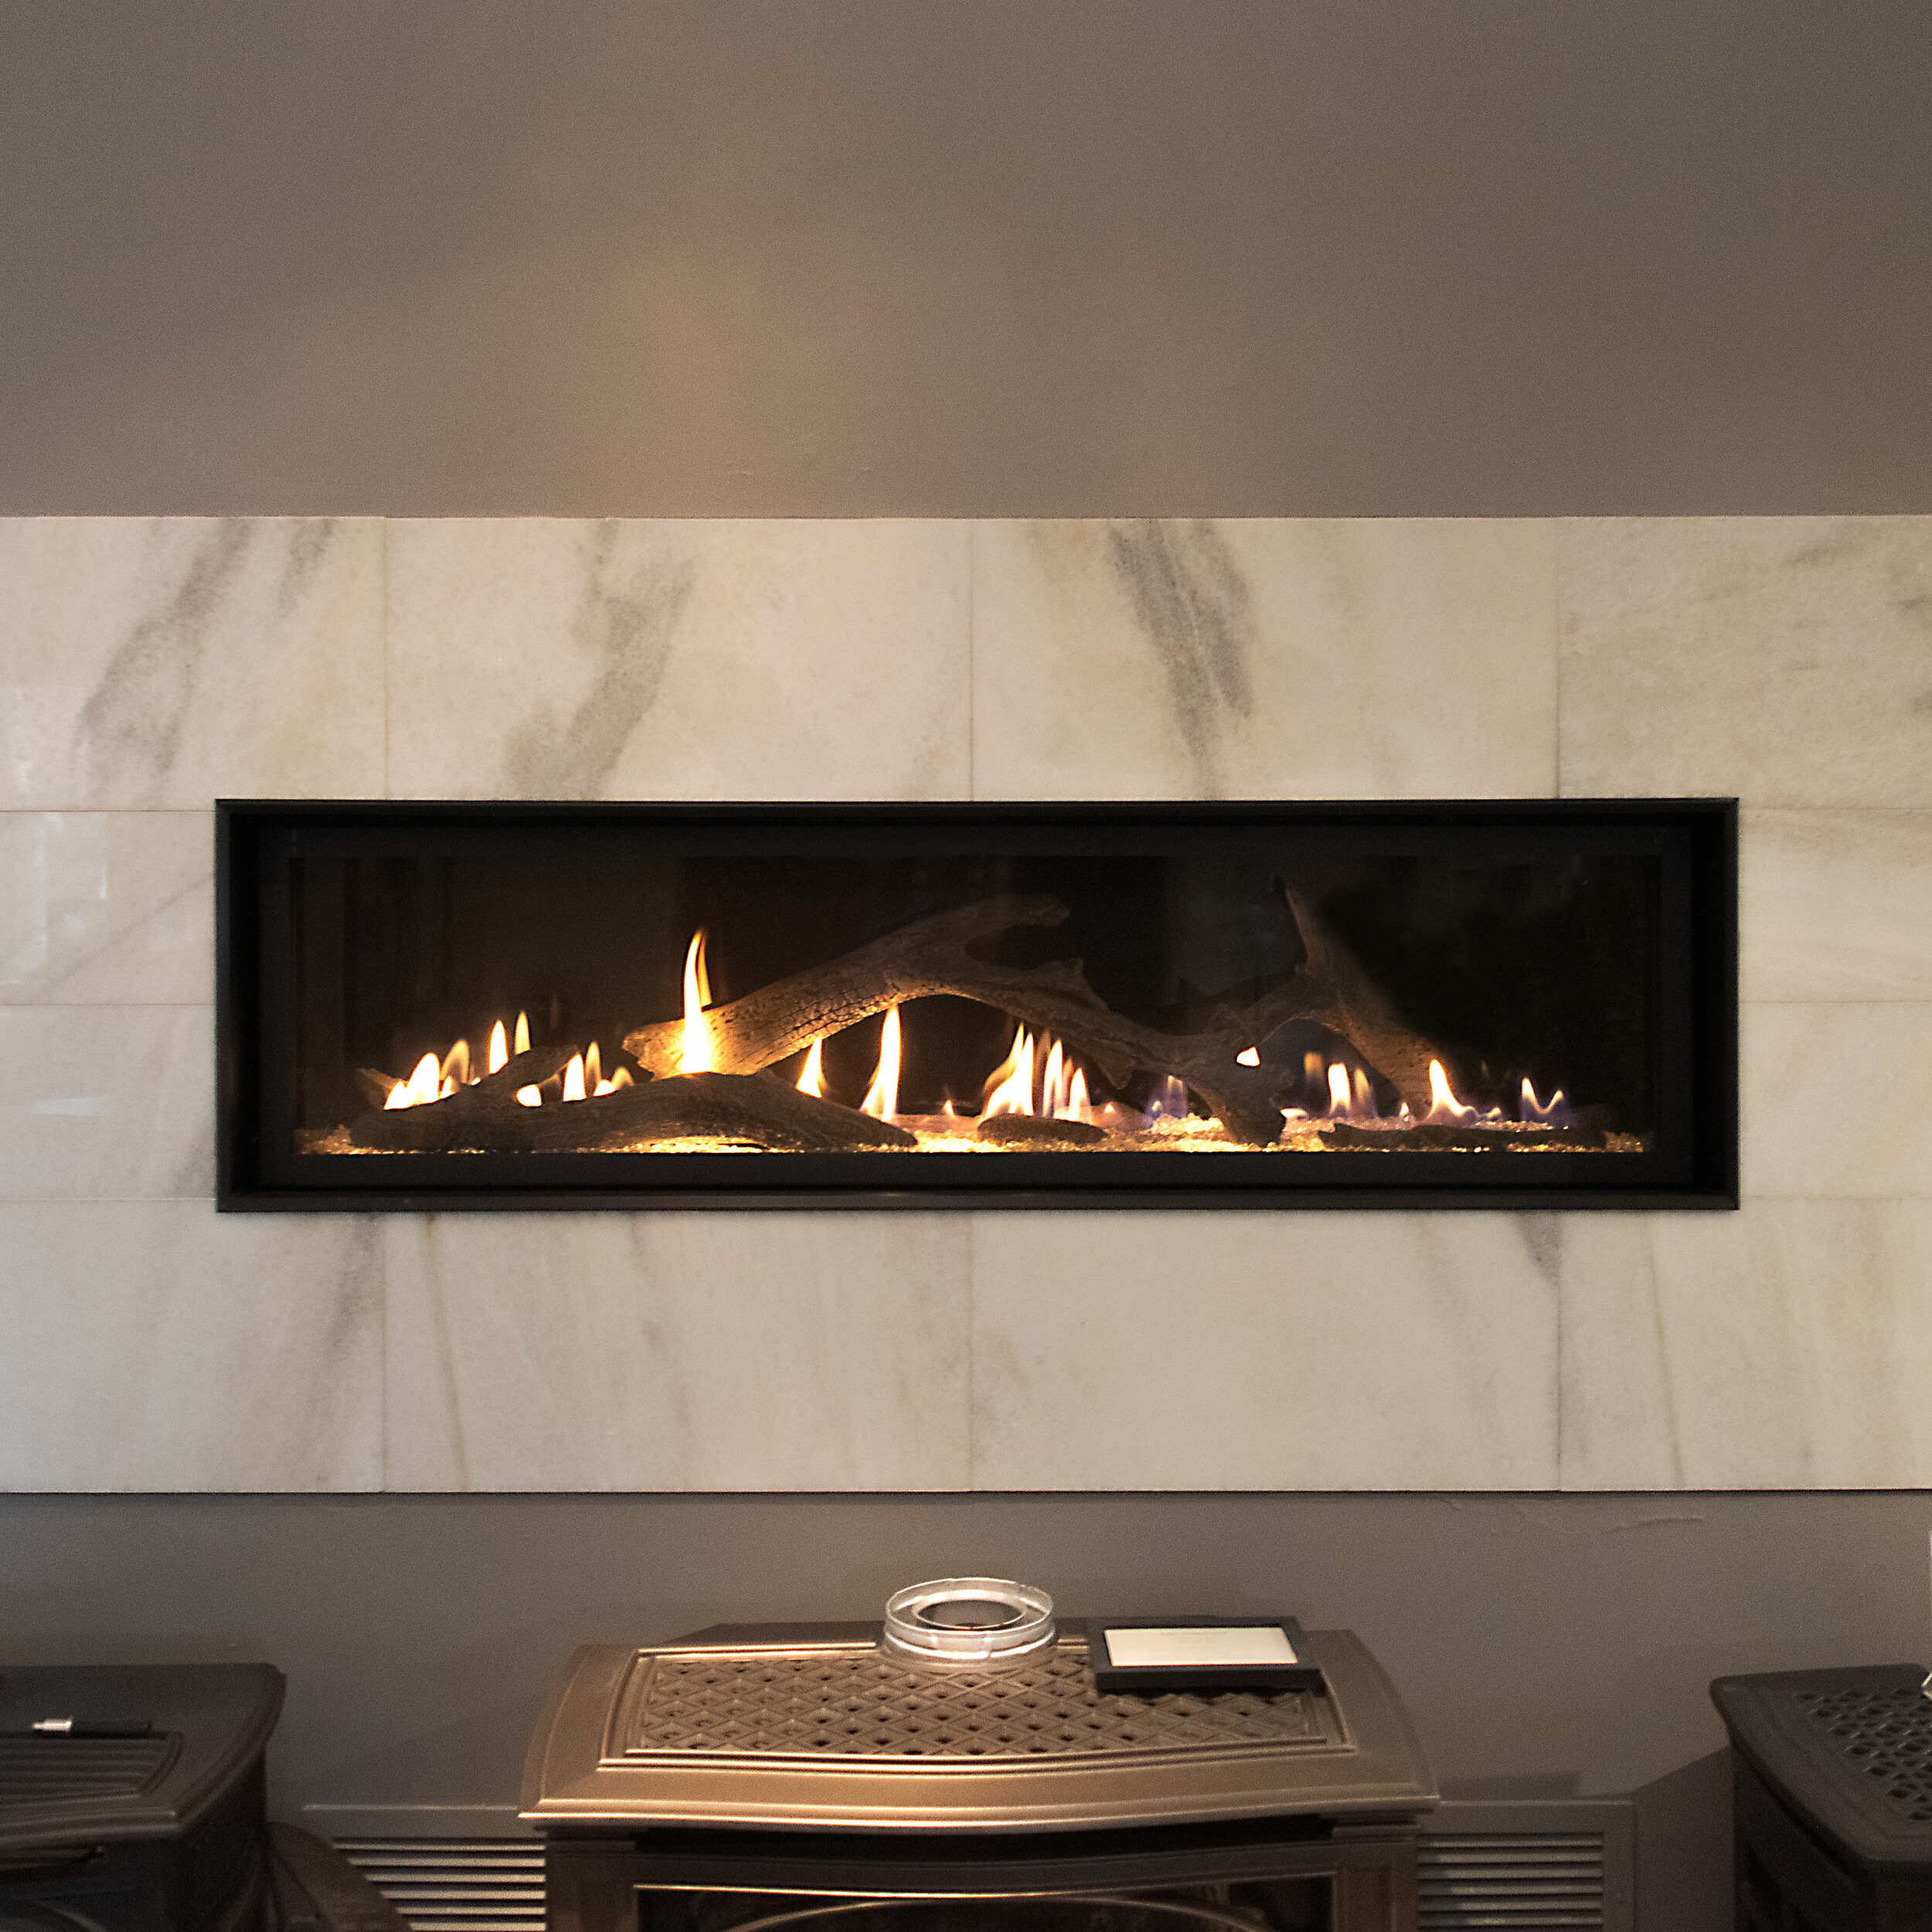 FireplaceX 6015 - ‧ Direct Vent Gas Fireplace - 56,000 BTU‧ Black Porcelain Enamel Fireback panels‧ Tile Trim Kit‧ Driftwood Log Set‧ Green Smart Remote Control‧ Fan‧ High Output home heater‧ Diamond-Fyre Linear Burner‧ Highly reliable